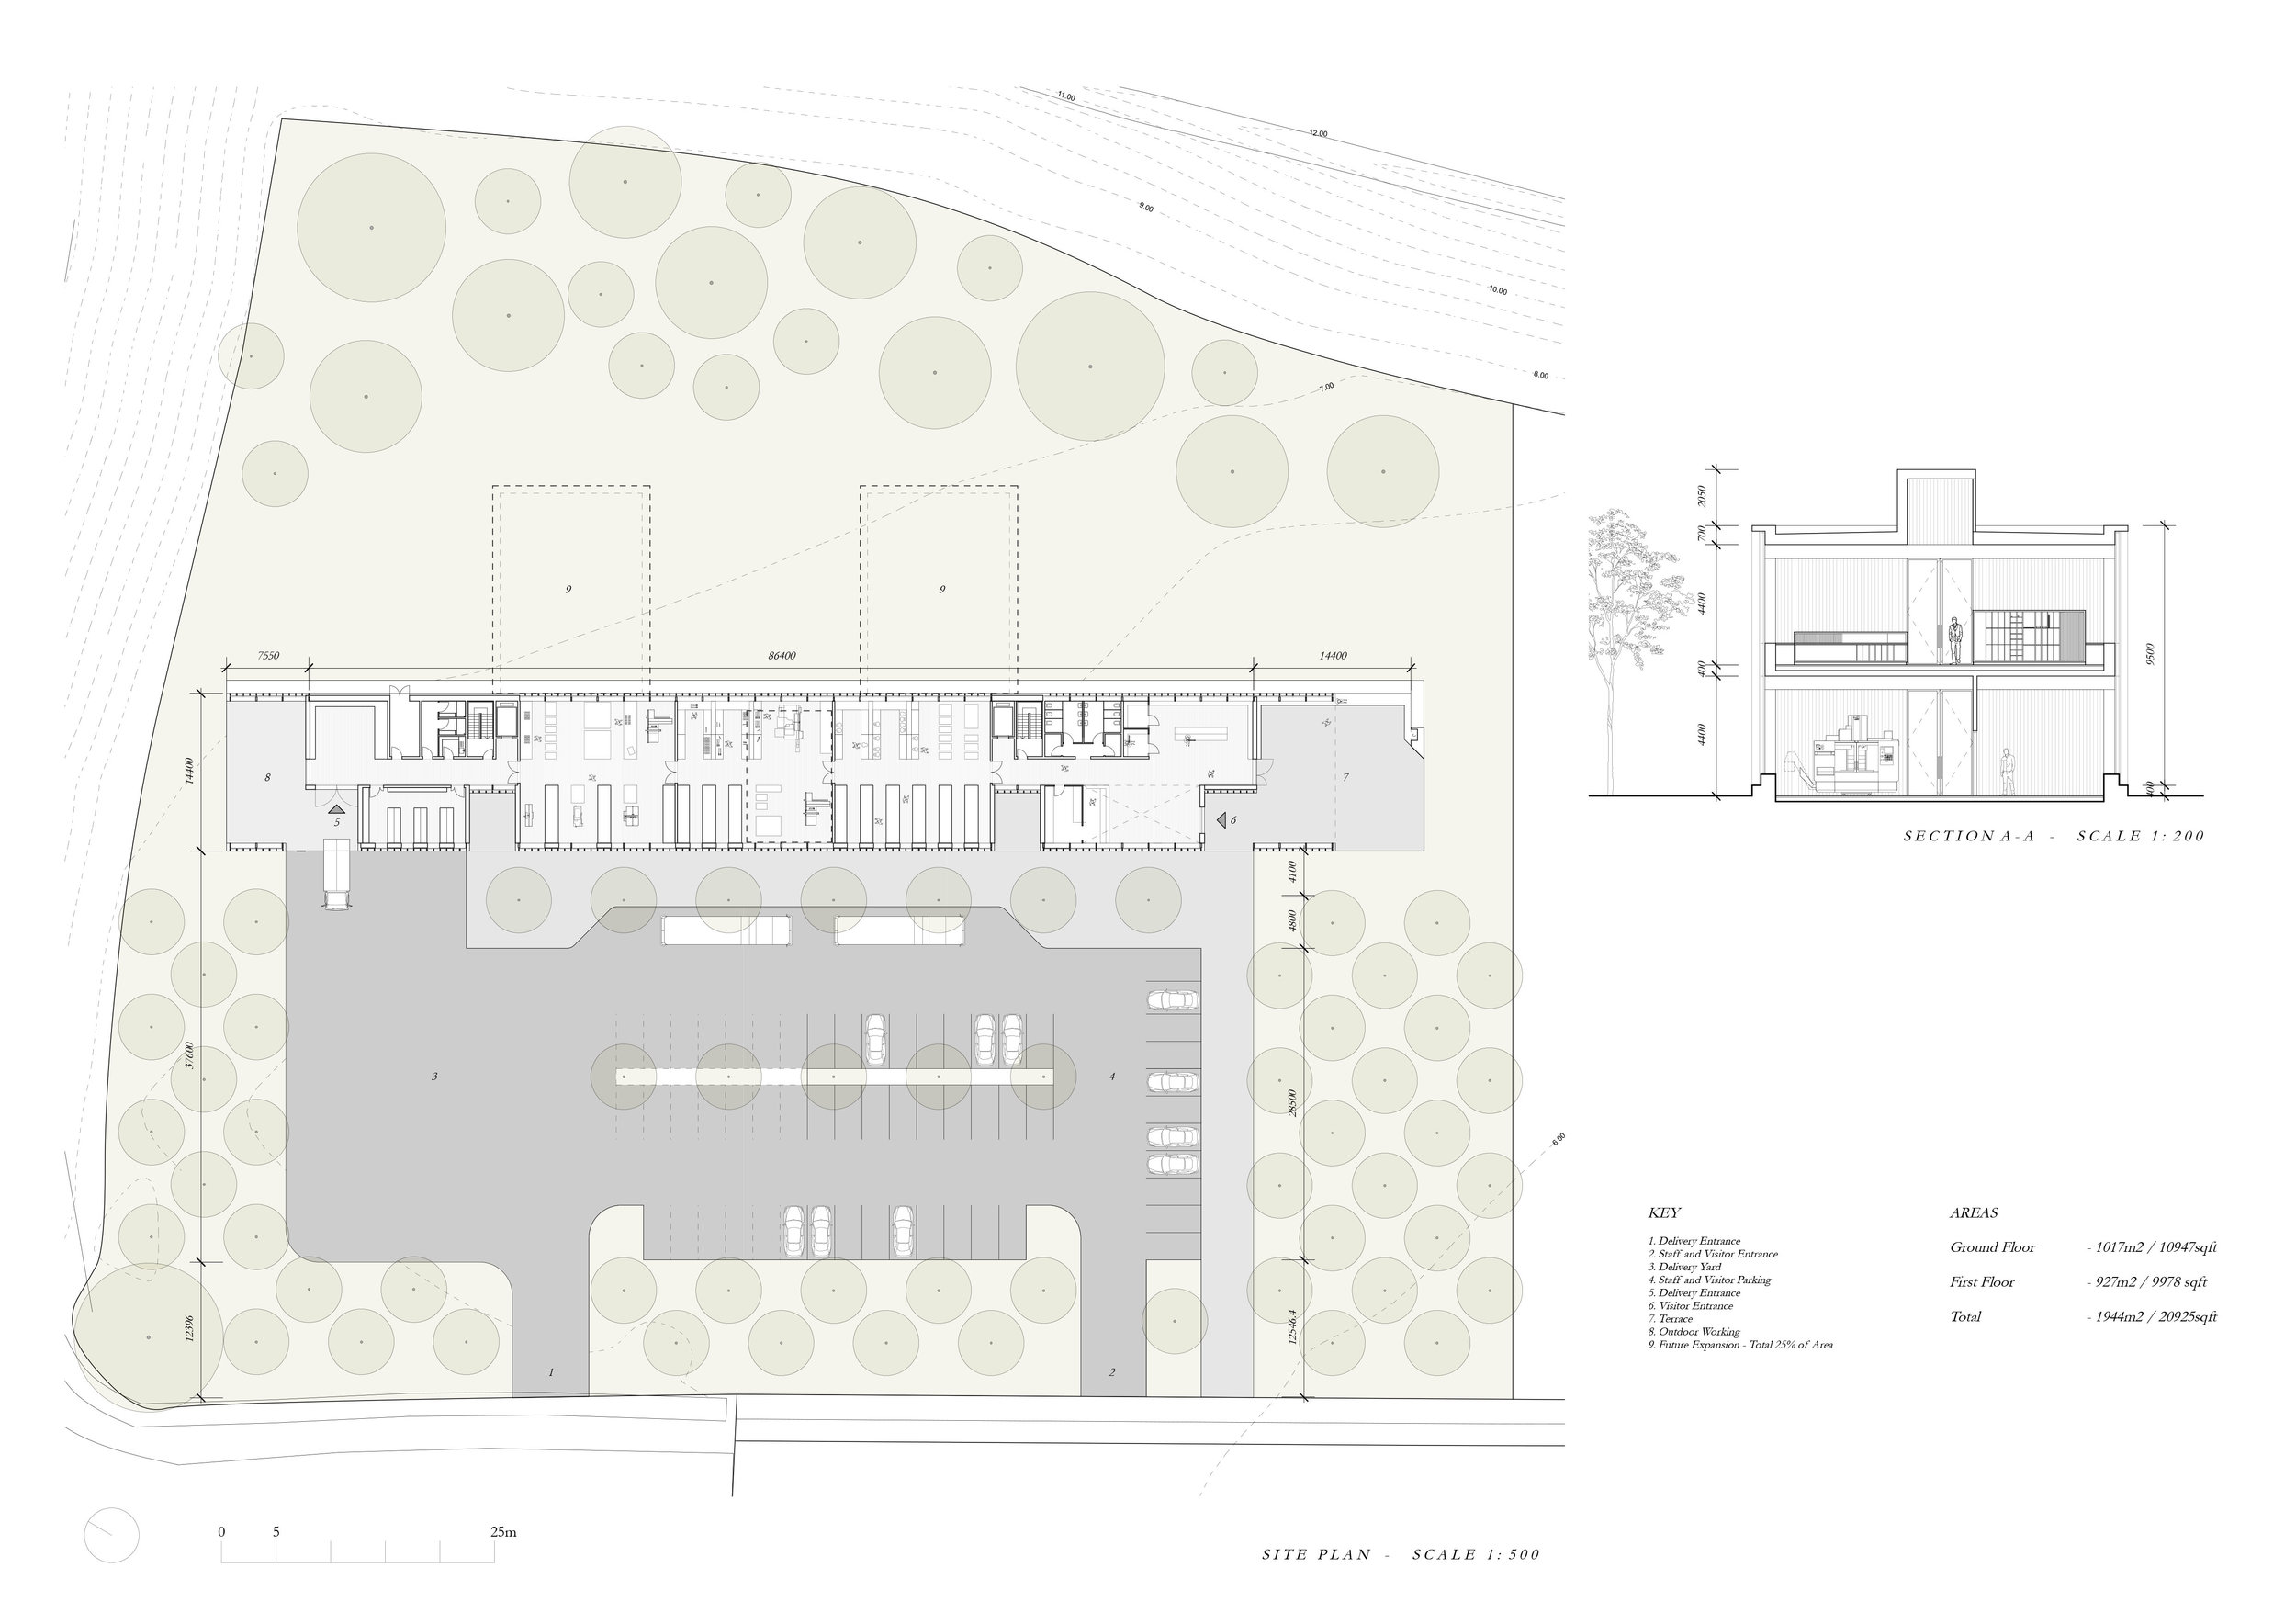 Site Plan A Small.jpg